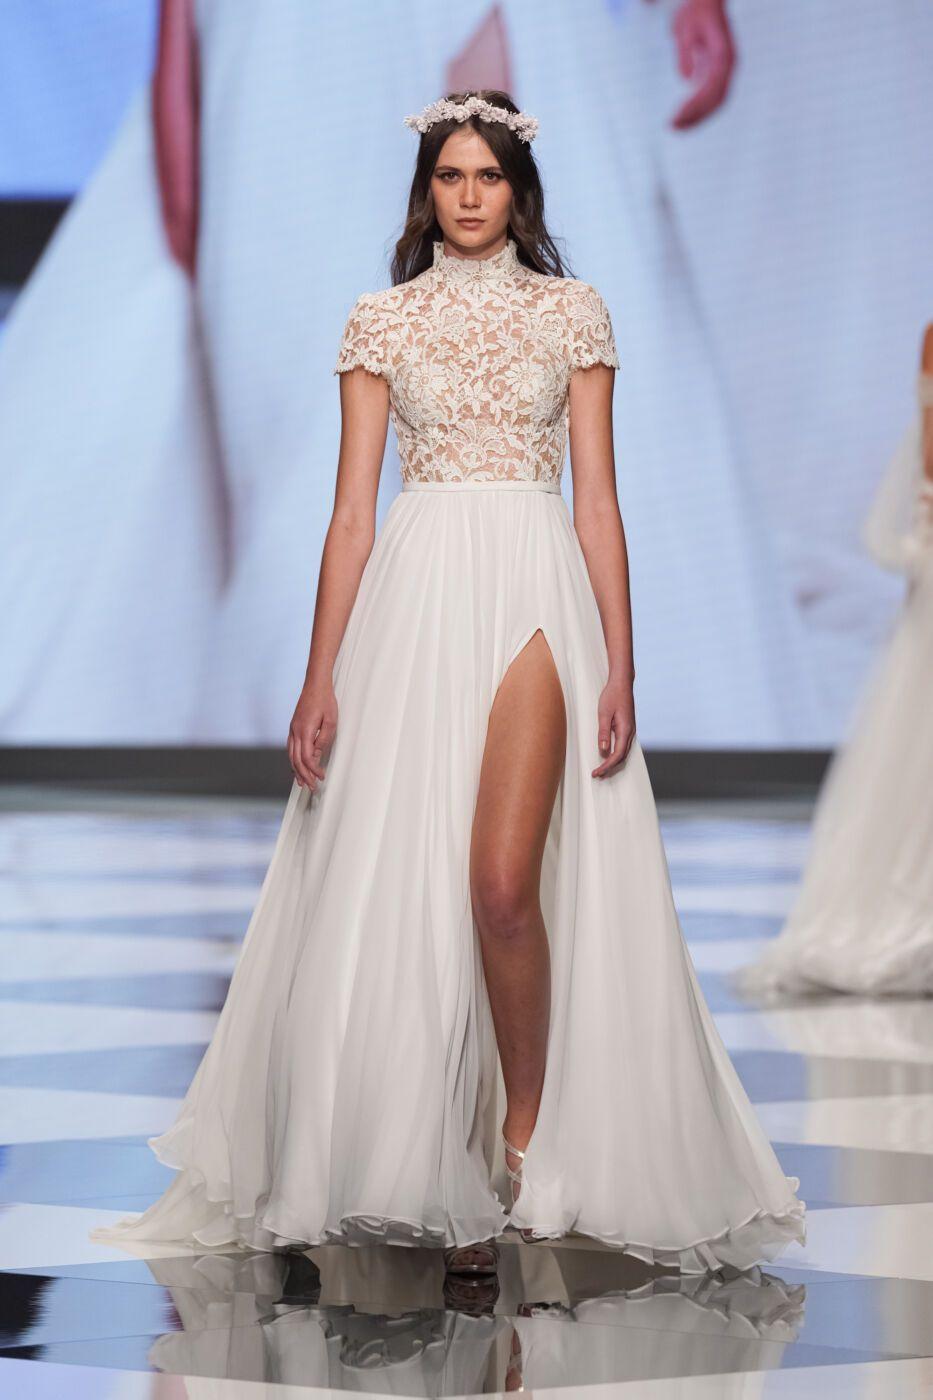 https://www.weddingmagazine.com.ua/wp-content/uploads/2021/08/maison-signore-2021-4.jpg